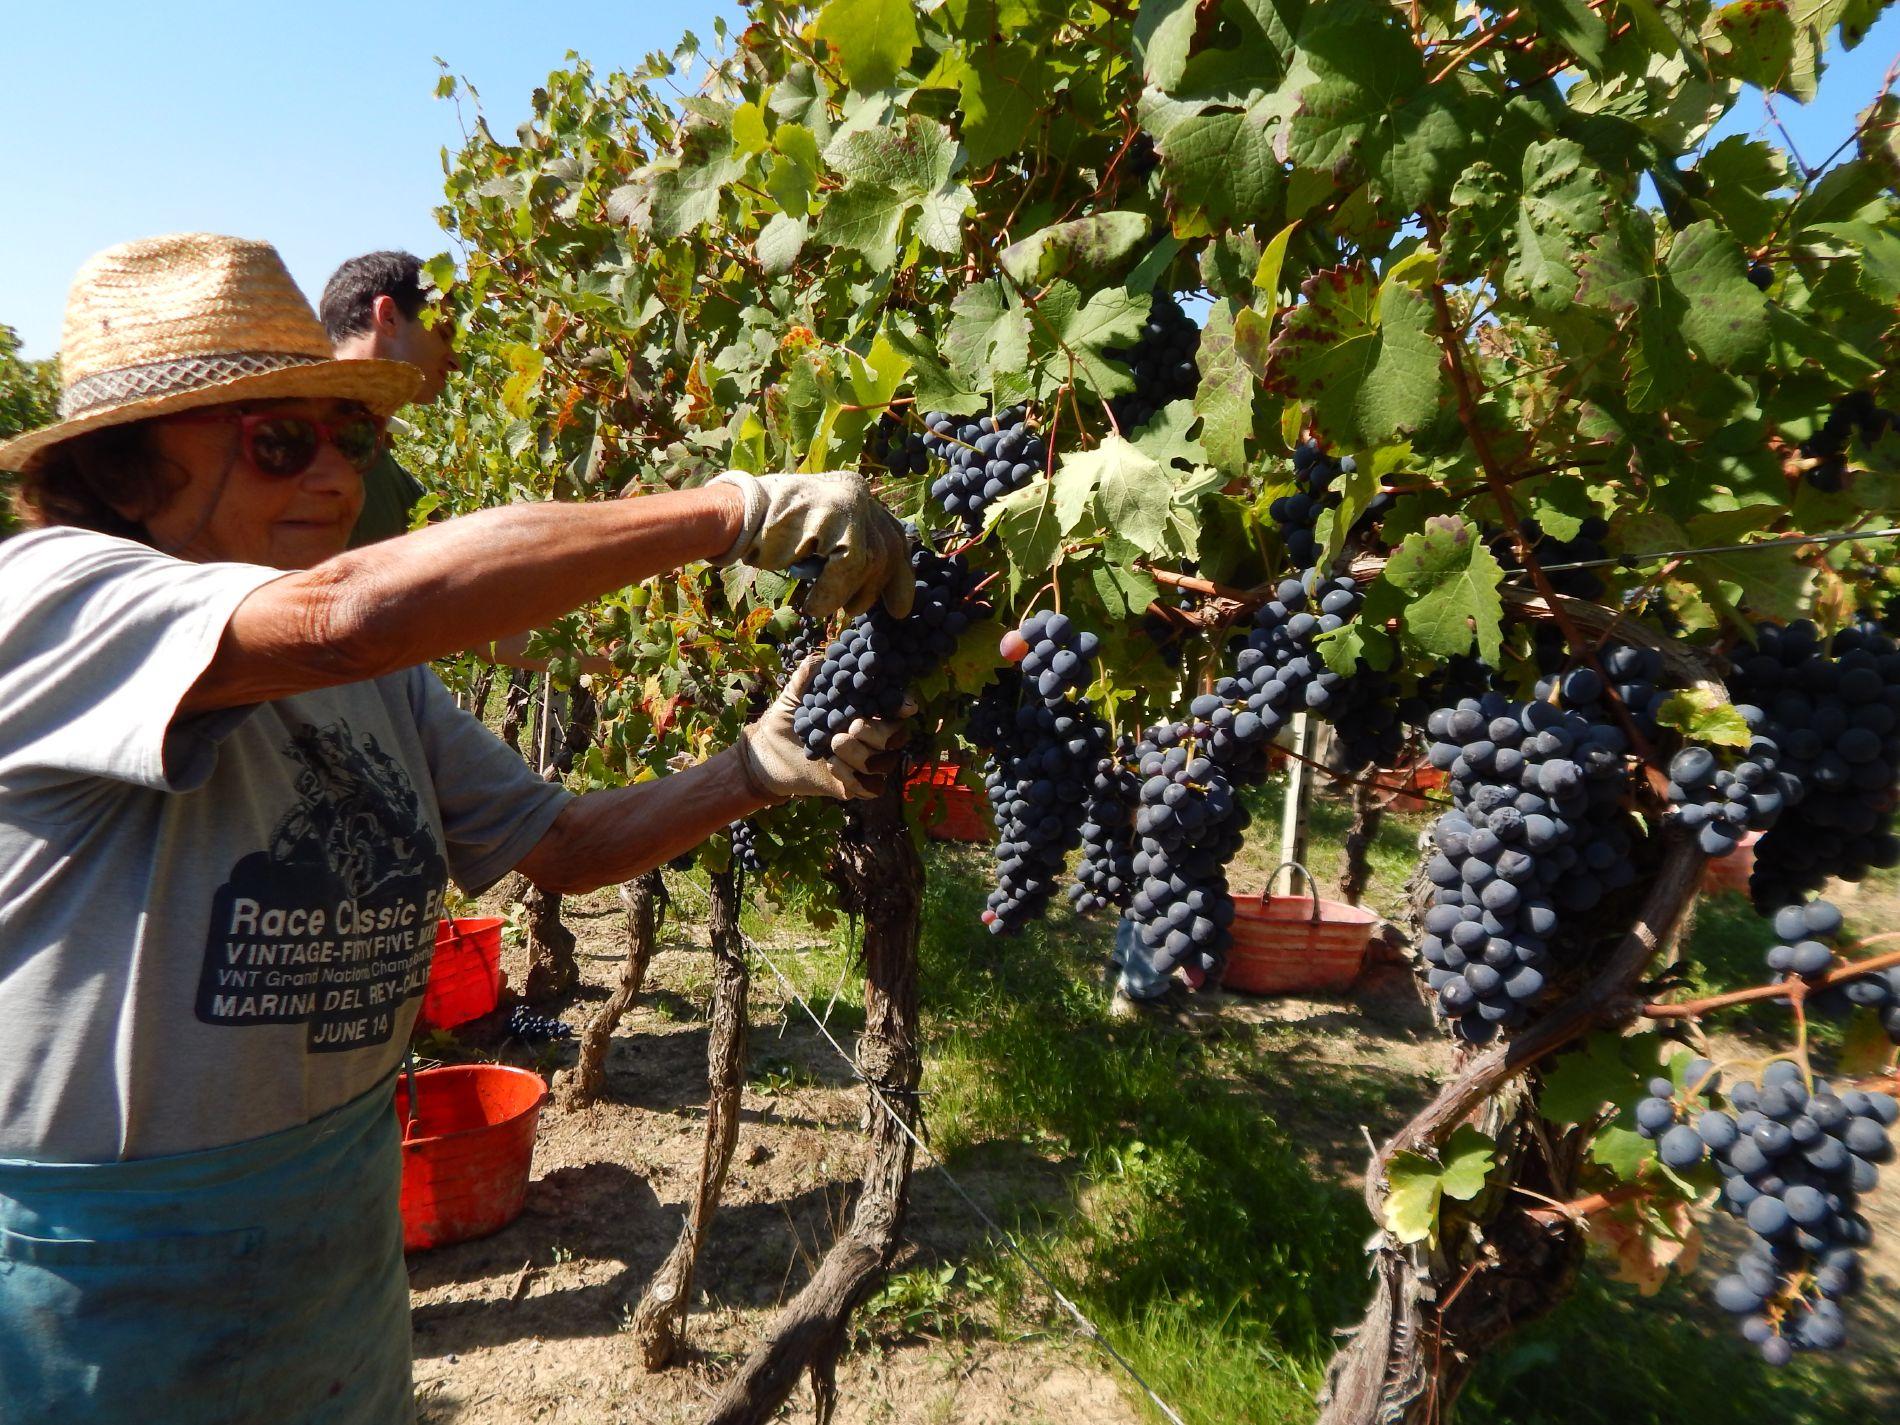 Macario Vini - vendemmia manuale